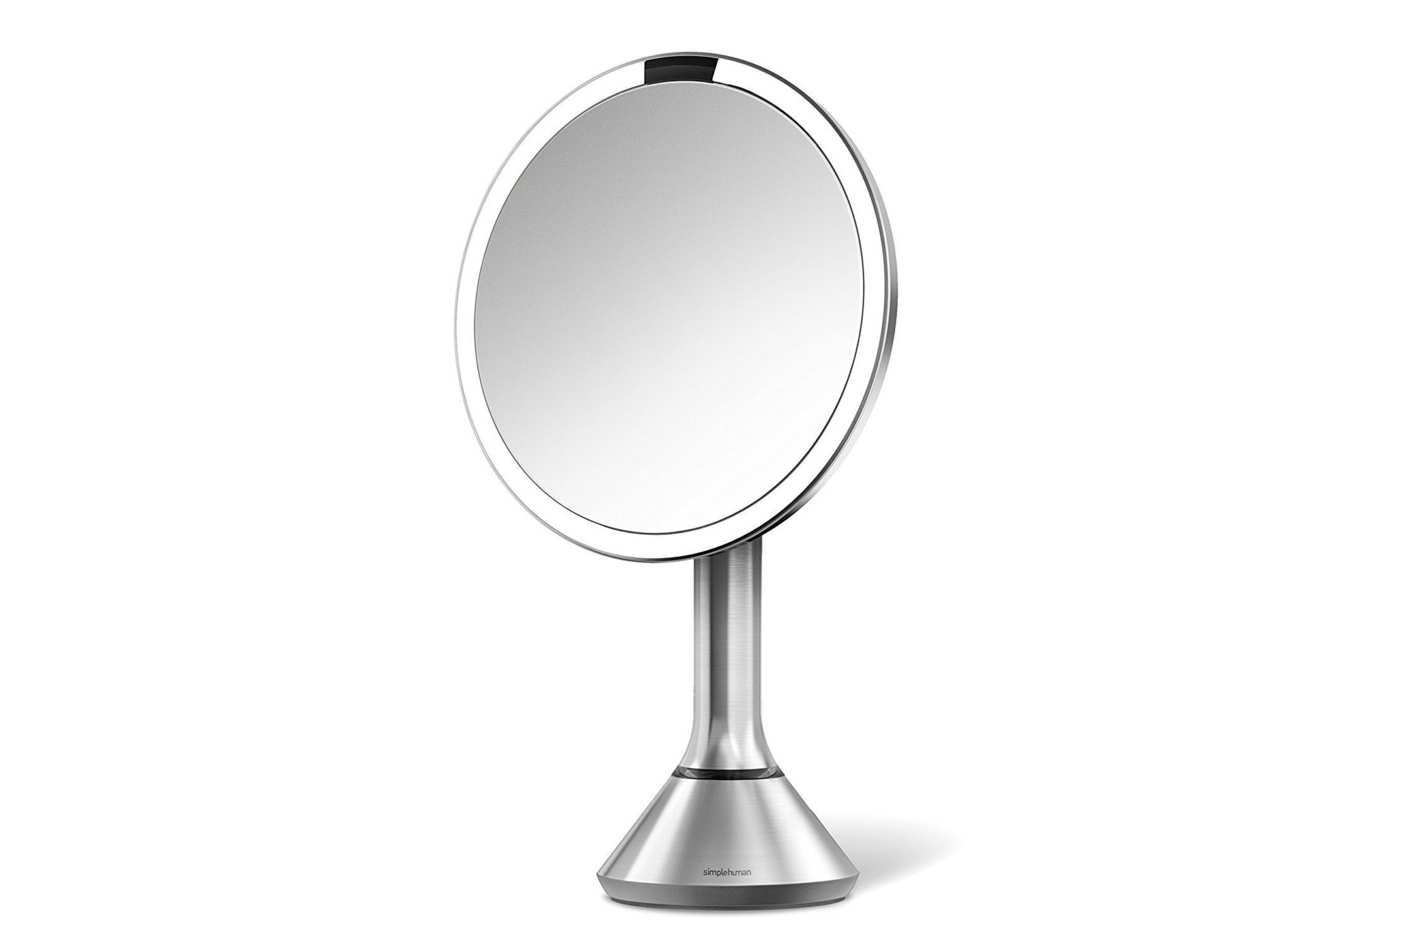 11 Best Vanity Makeup Mirrors Lights 2017: Lighted Mirrors Regarding Lit Makeup Mirrors (View 5 of 20)